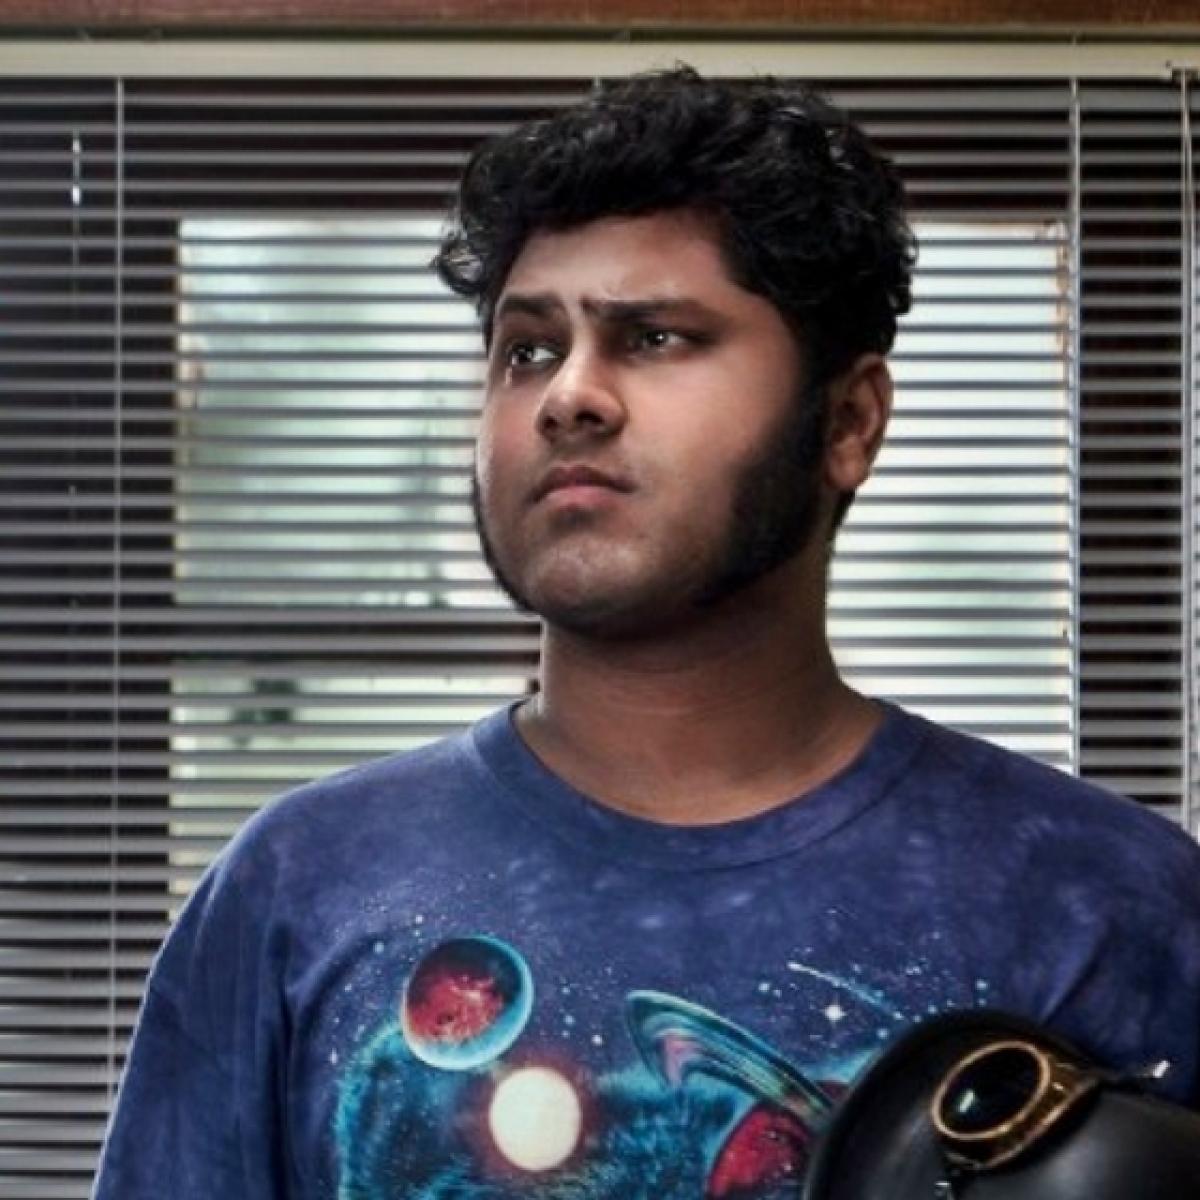 FPJ Exclusive: Year after #MeToo storm, new audio leaked of comedian Utsav Chakraborty pleading innocence